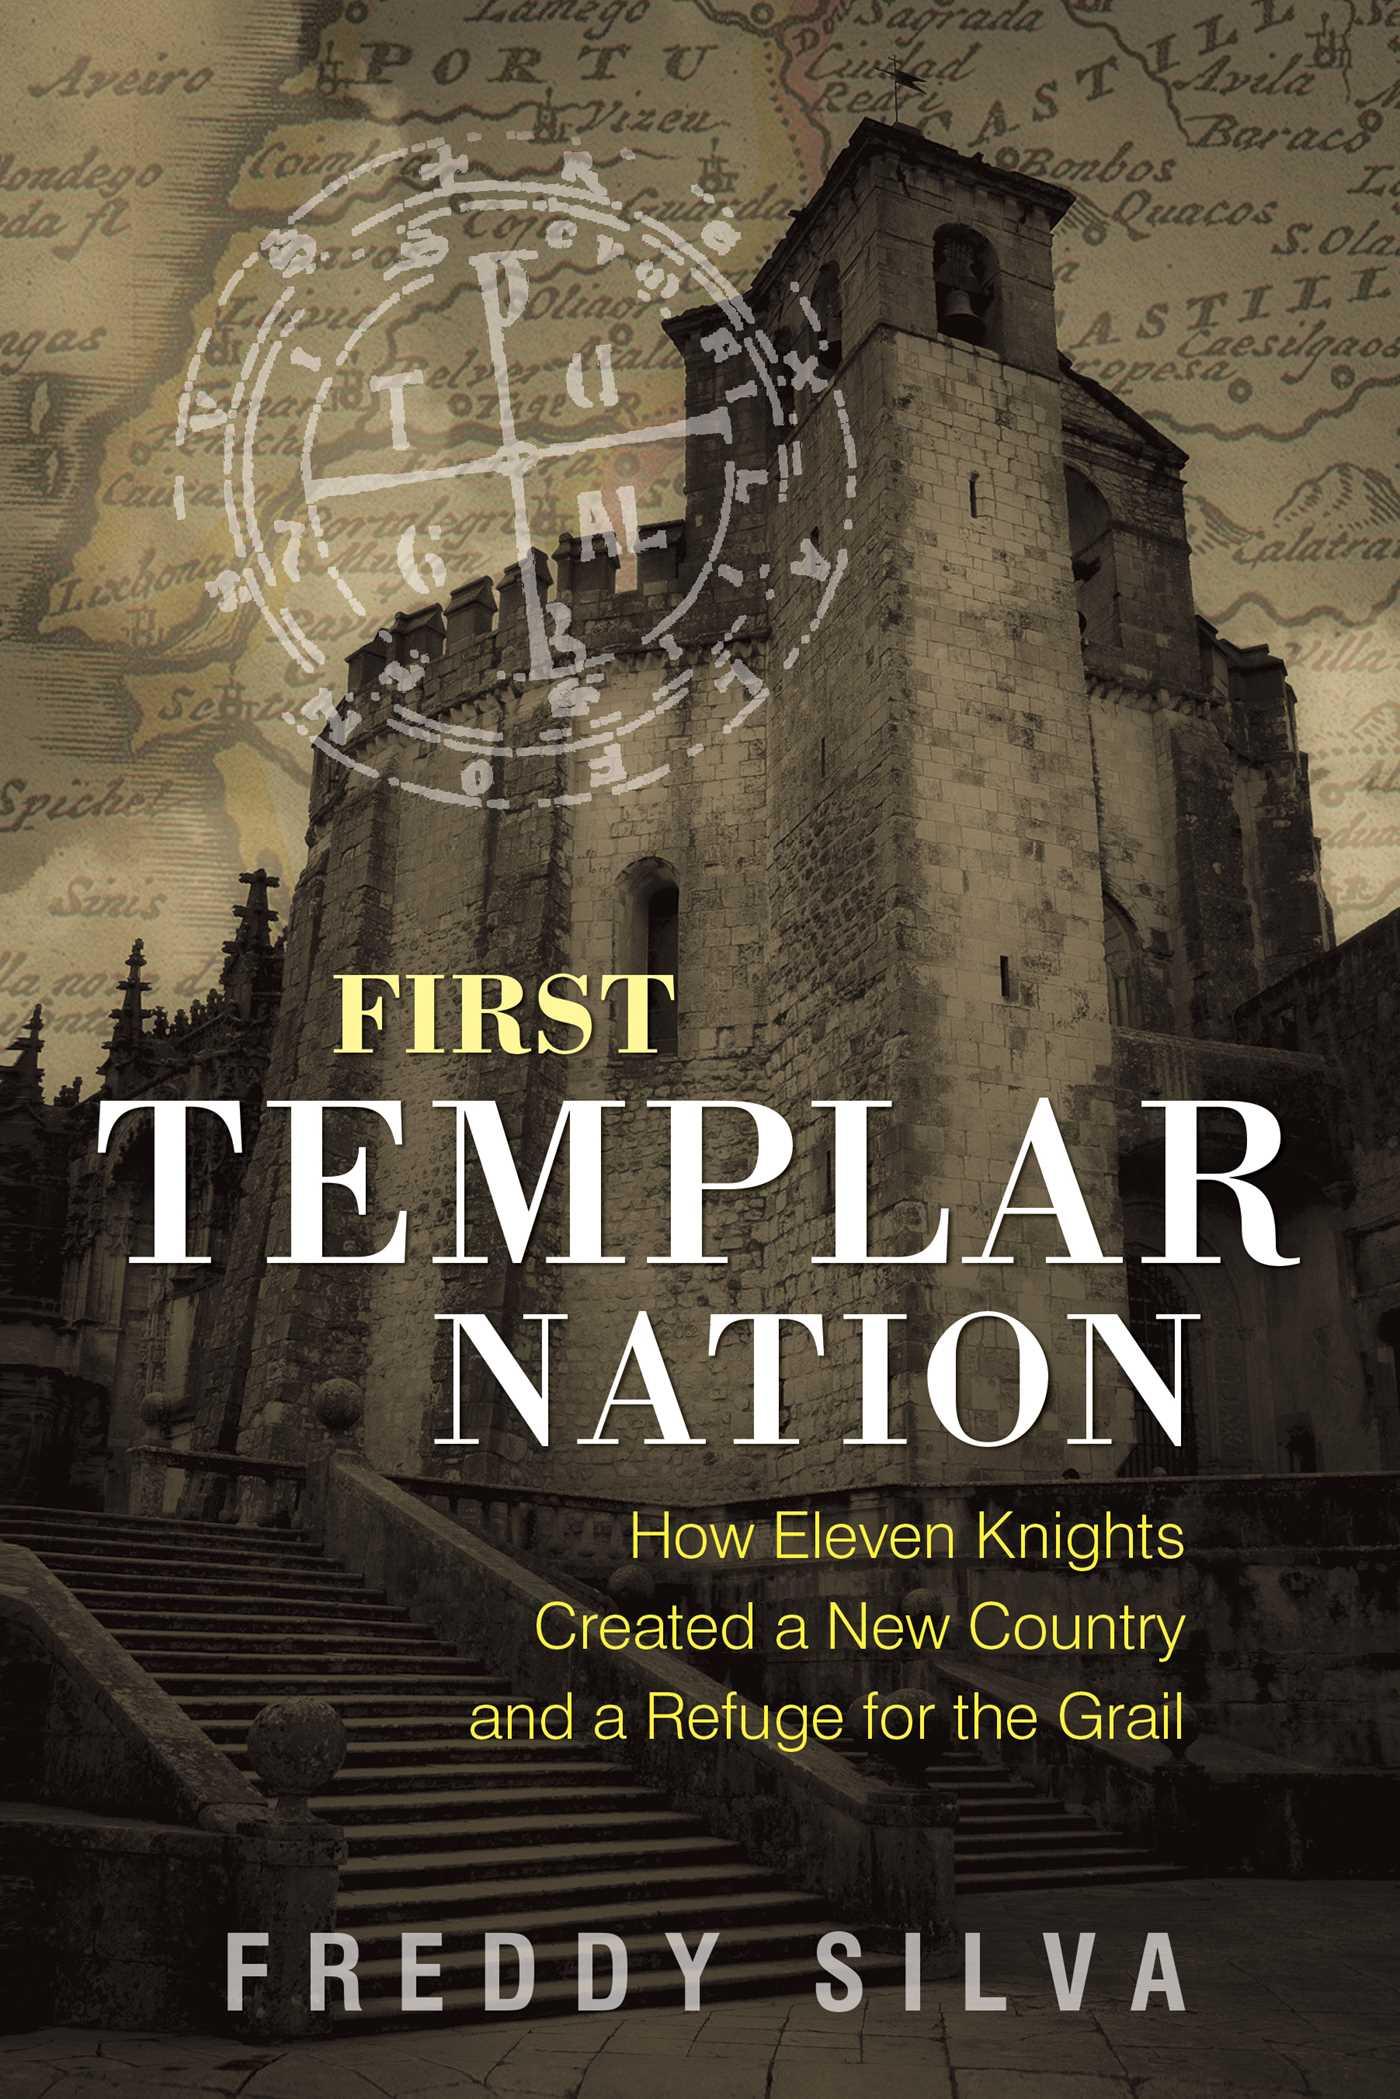 First templar nation 9781620556542 hr